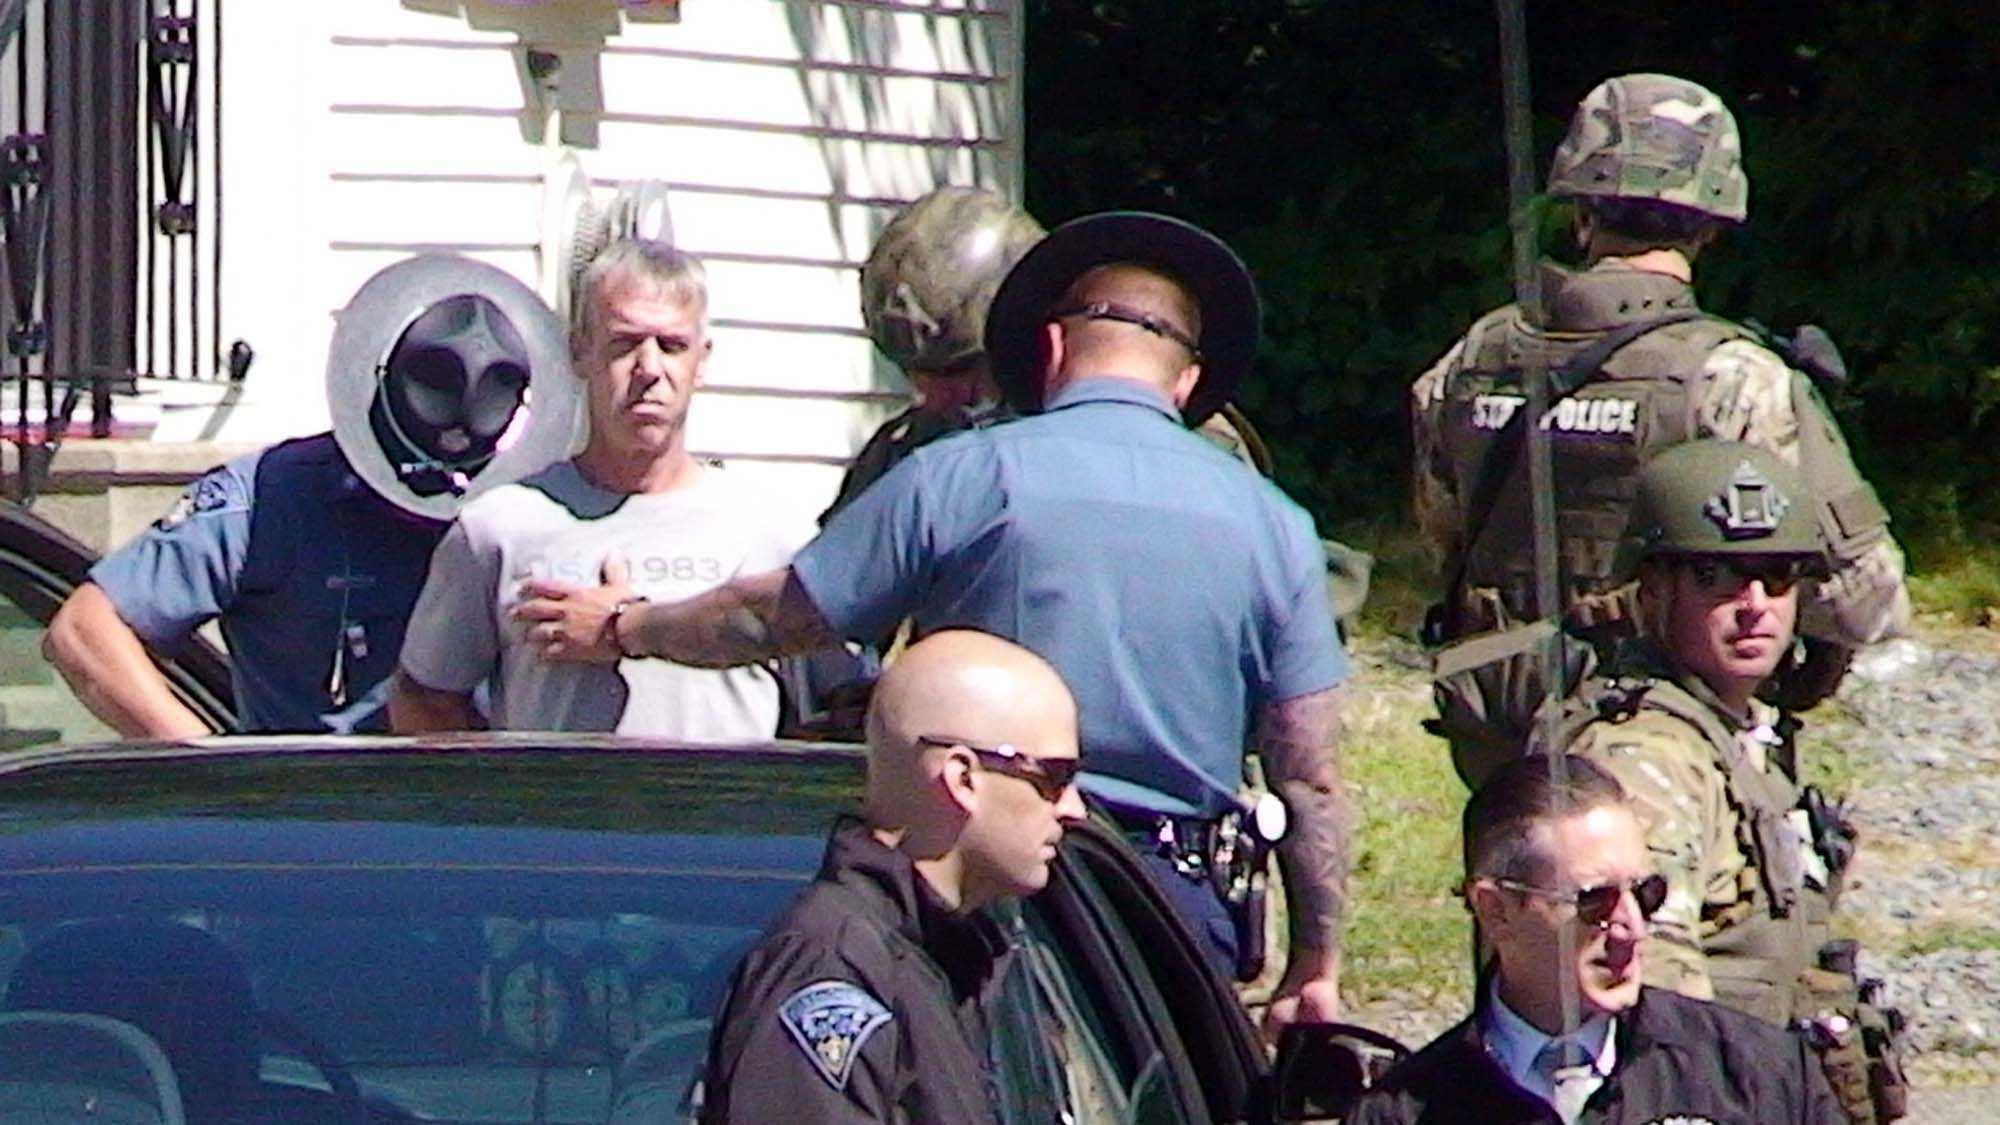 Buzzards bay arrest